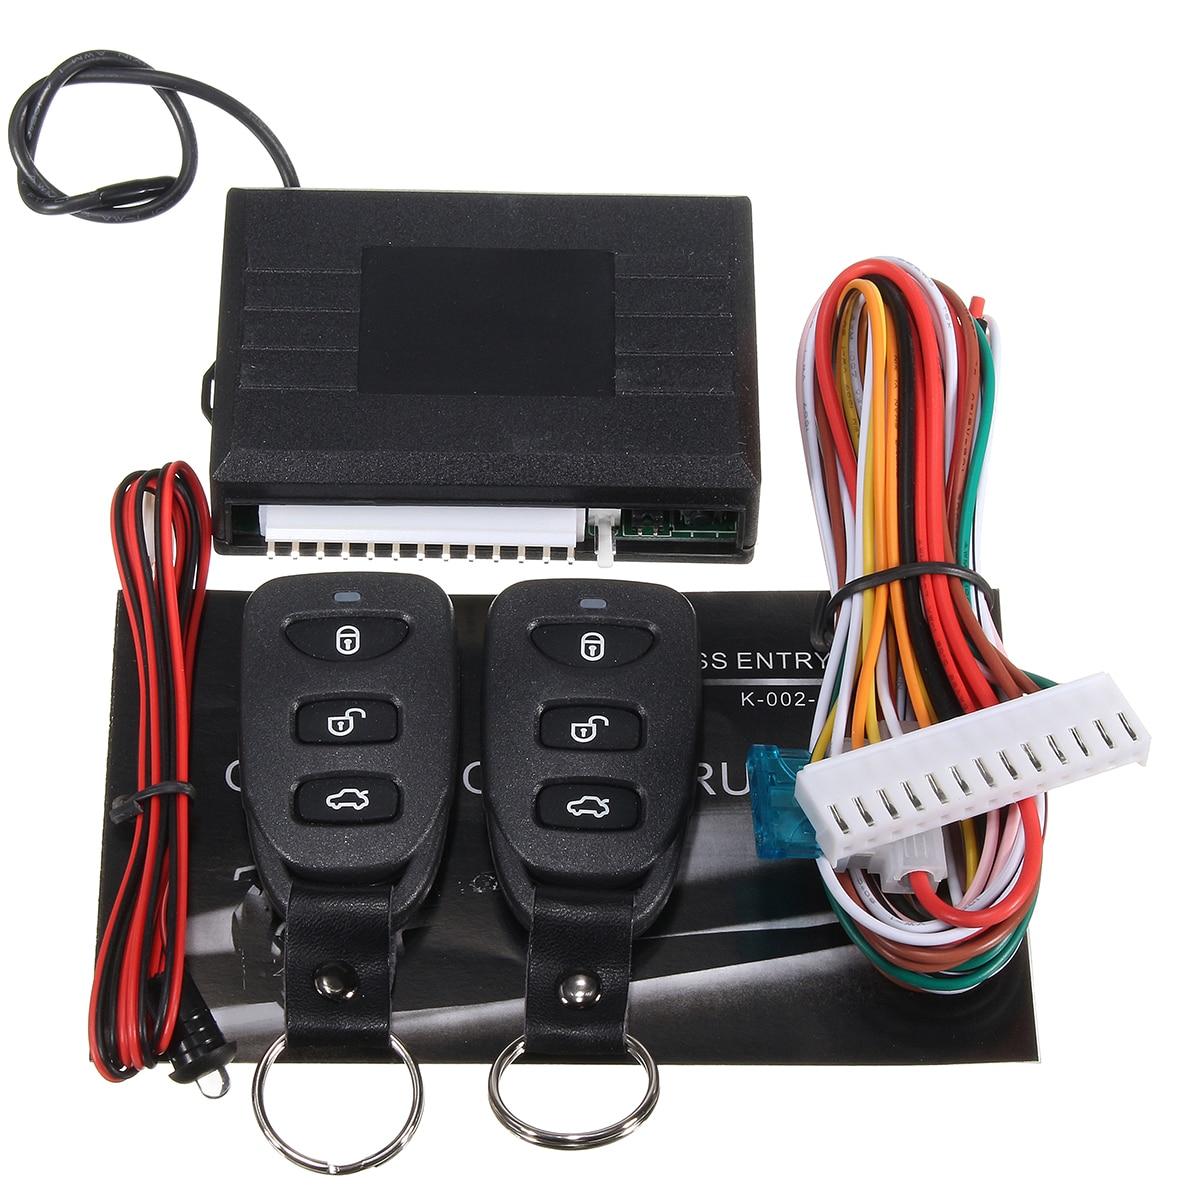 LB-402 12V Car Keyless Entry System Remote Control Center Lock Control Box And Remote Control For Automobile